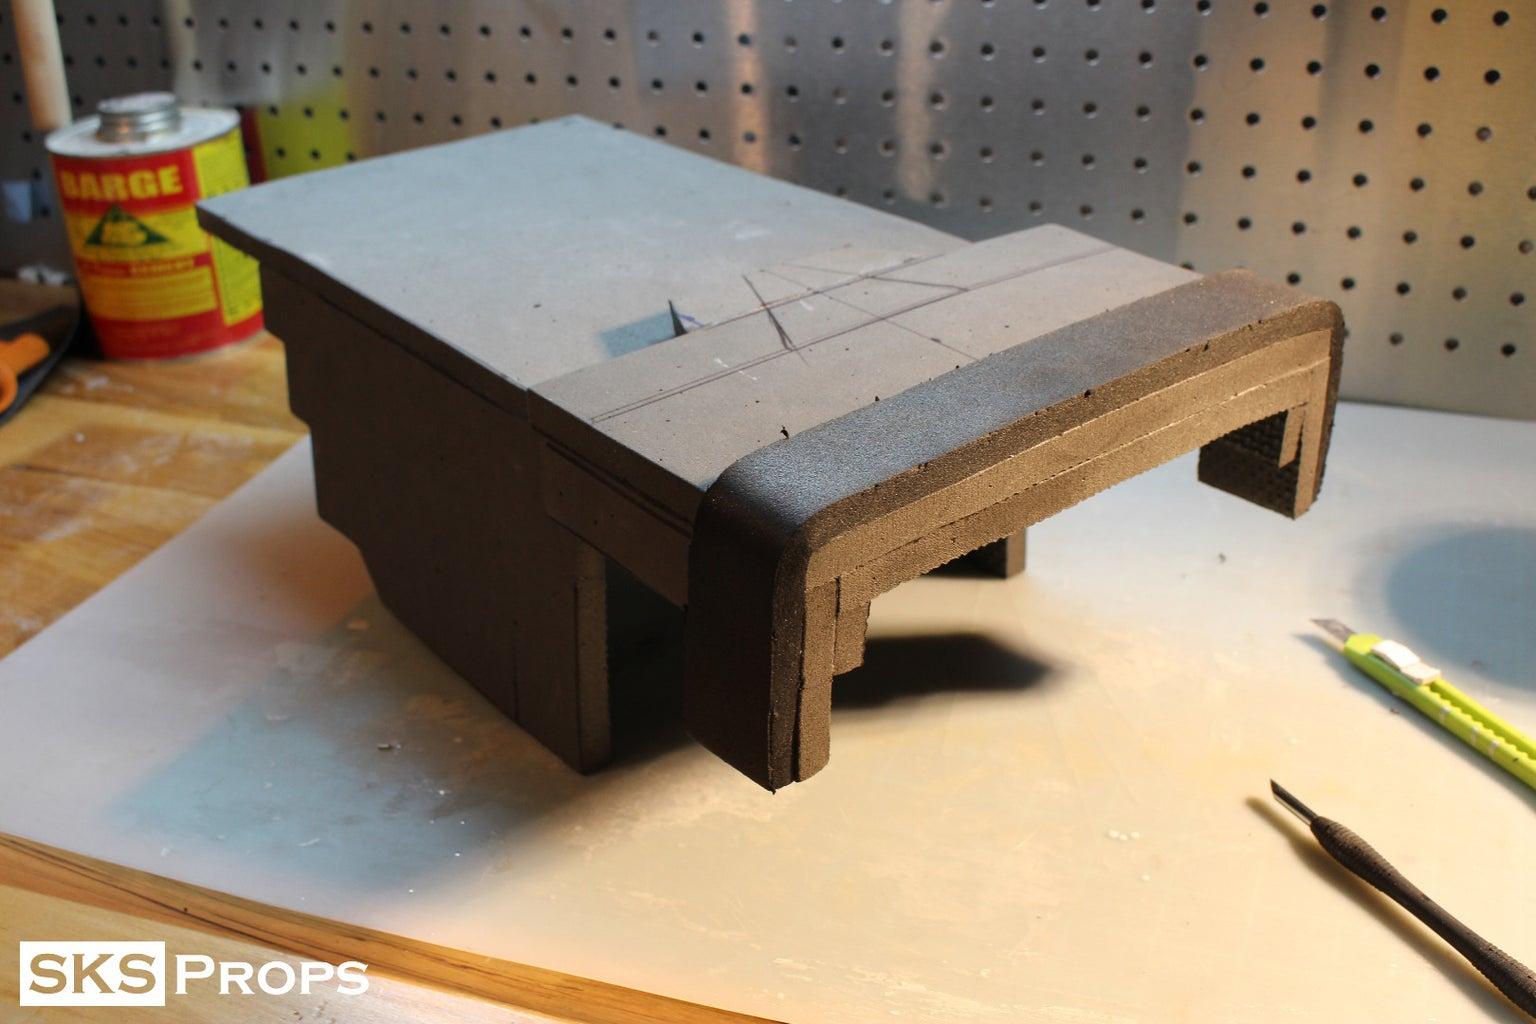 Constructing Large Shapes